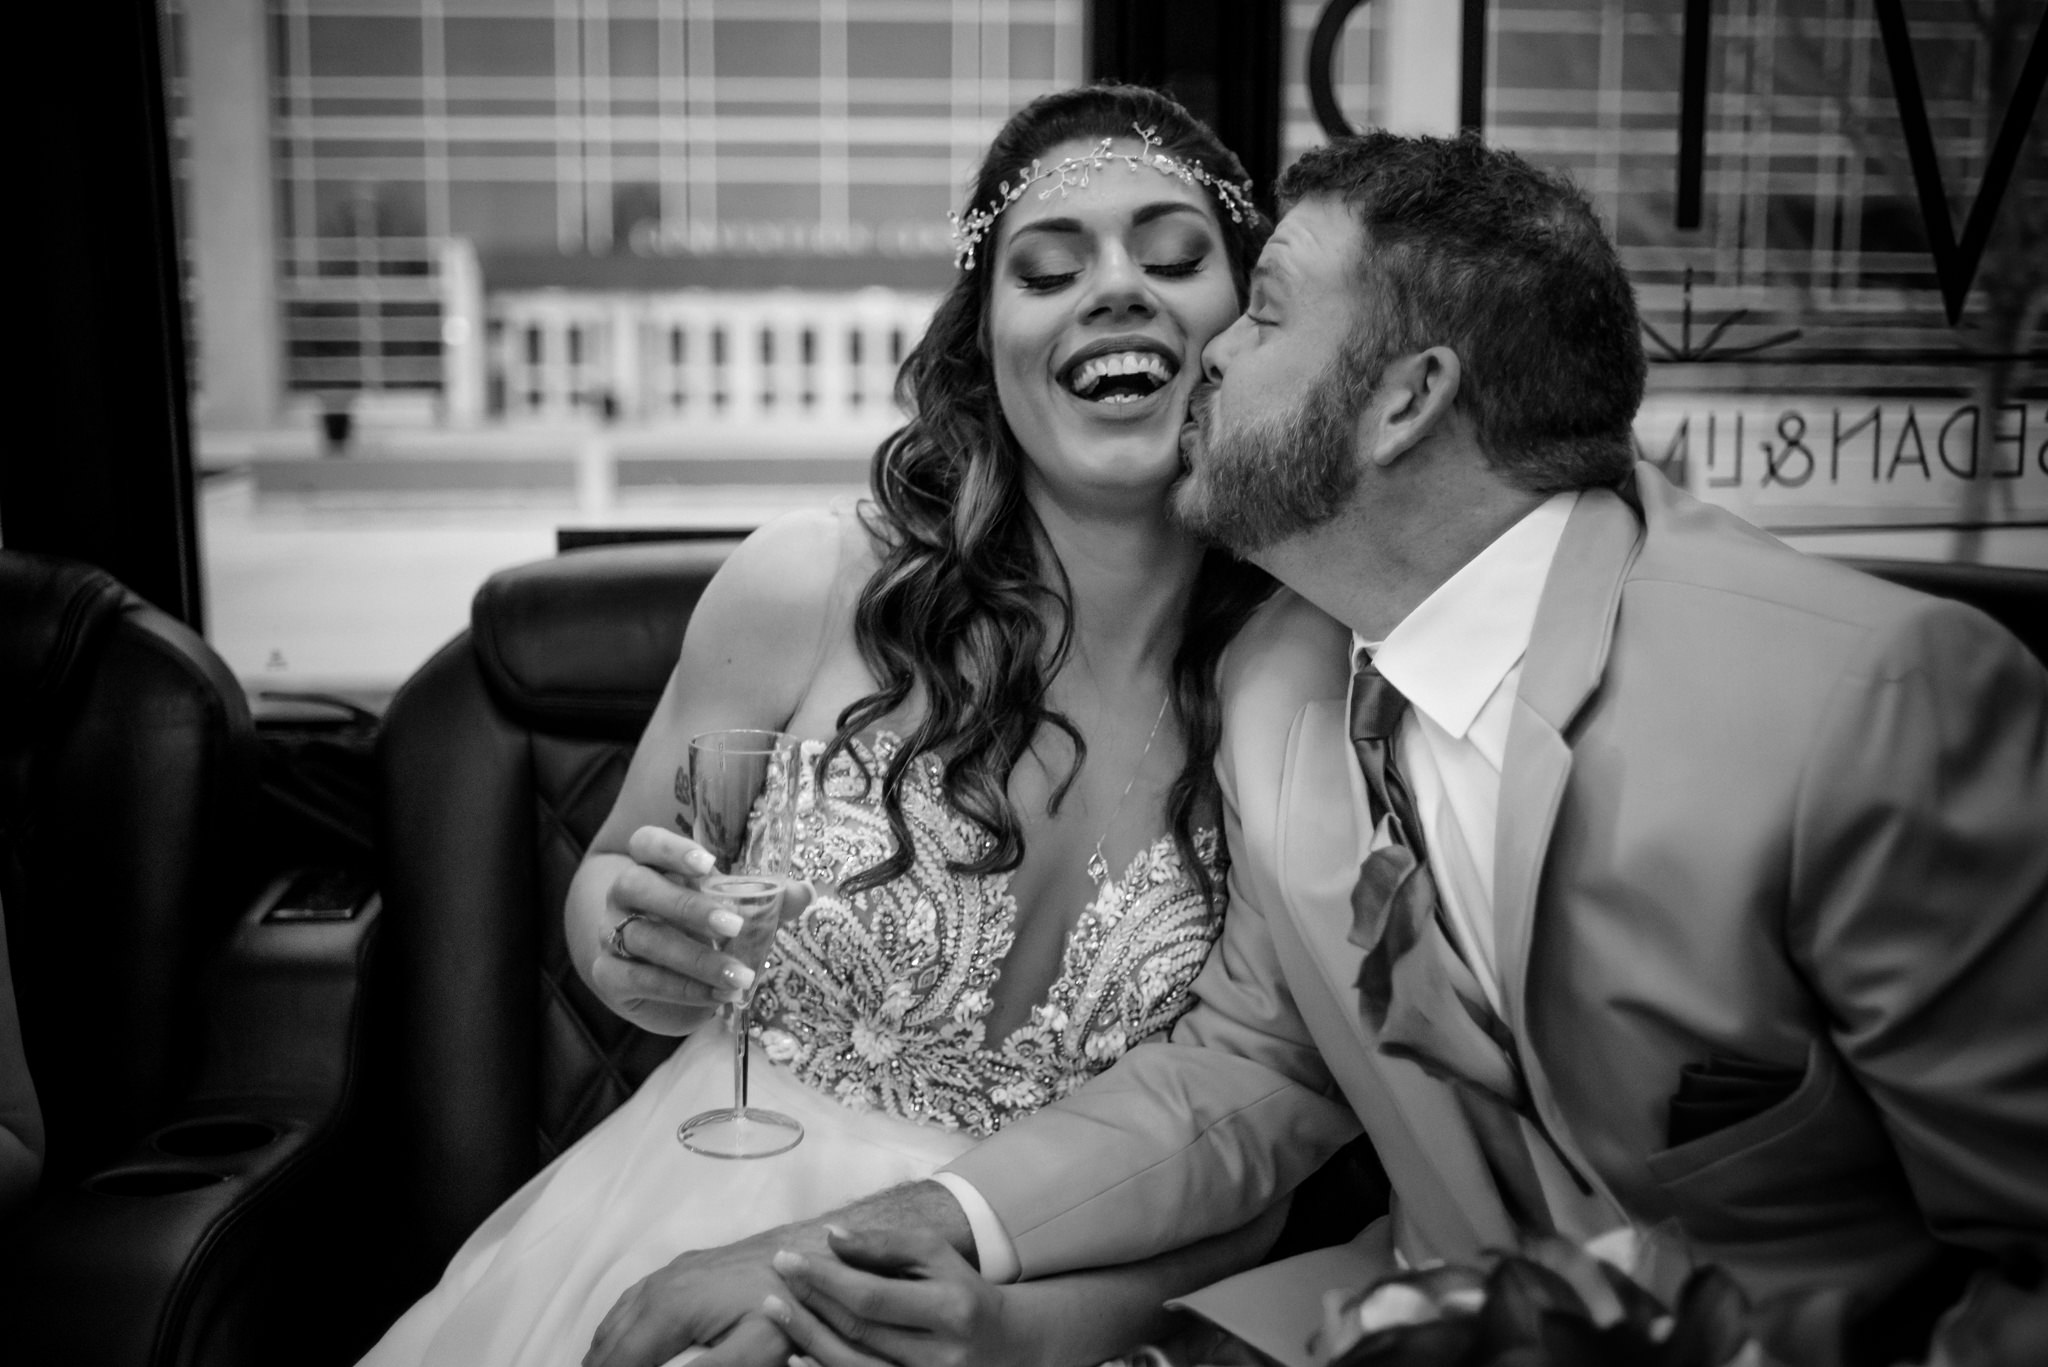 HILTON-OMAHA-WEDDING-PHOTOGRAPHER-JM-STUDIOS-OMAHA-LIV-BRICE-011.jpg